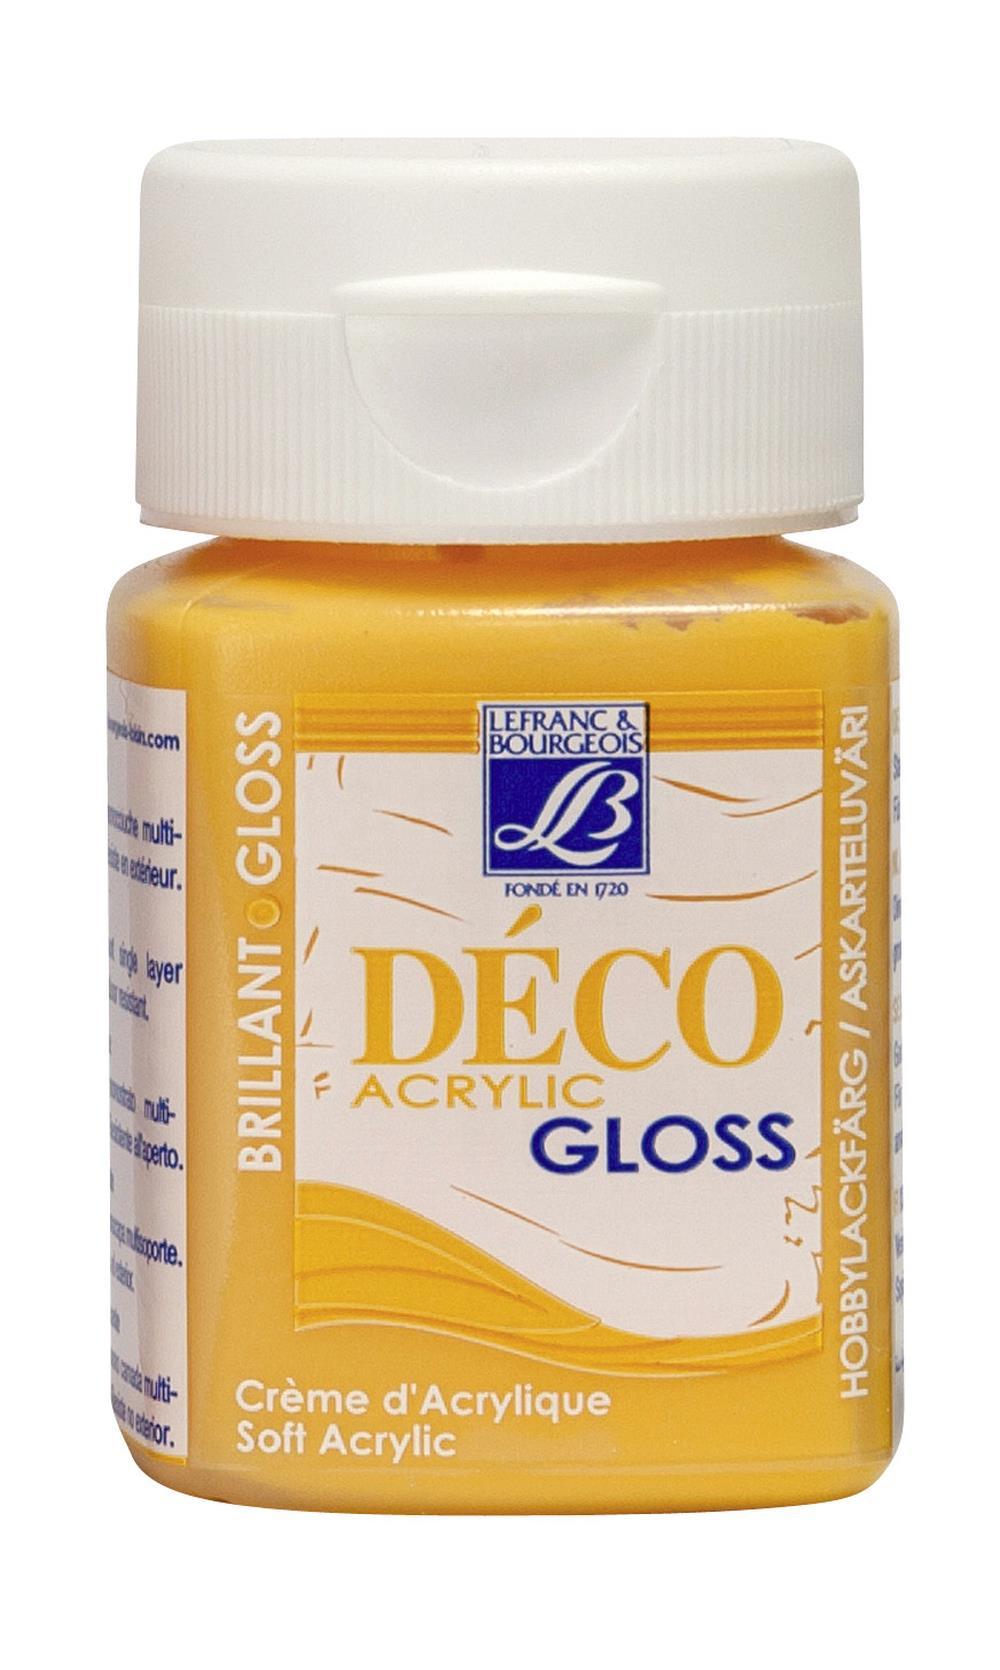 Hobbyfärg L&B Deco Gloss Akryl 50ml  Papaya 244 (4F) Utgår